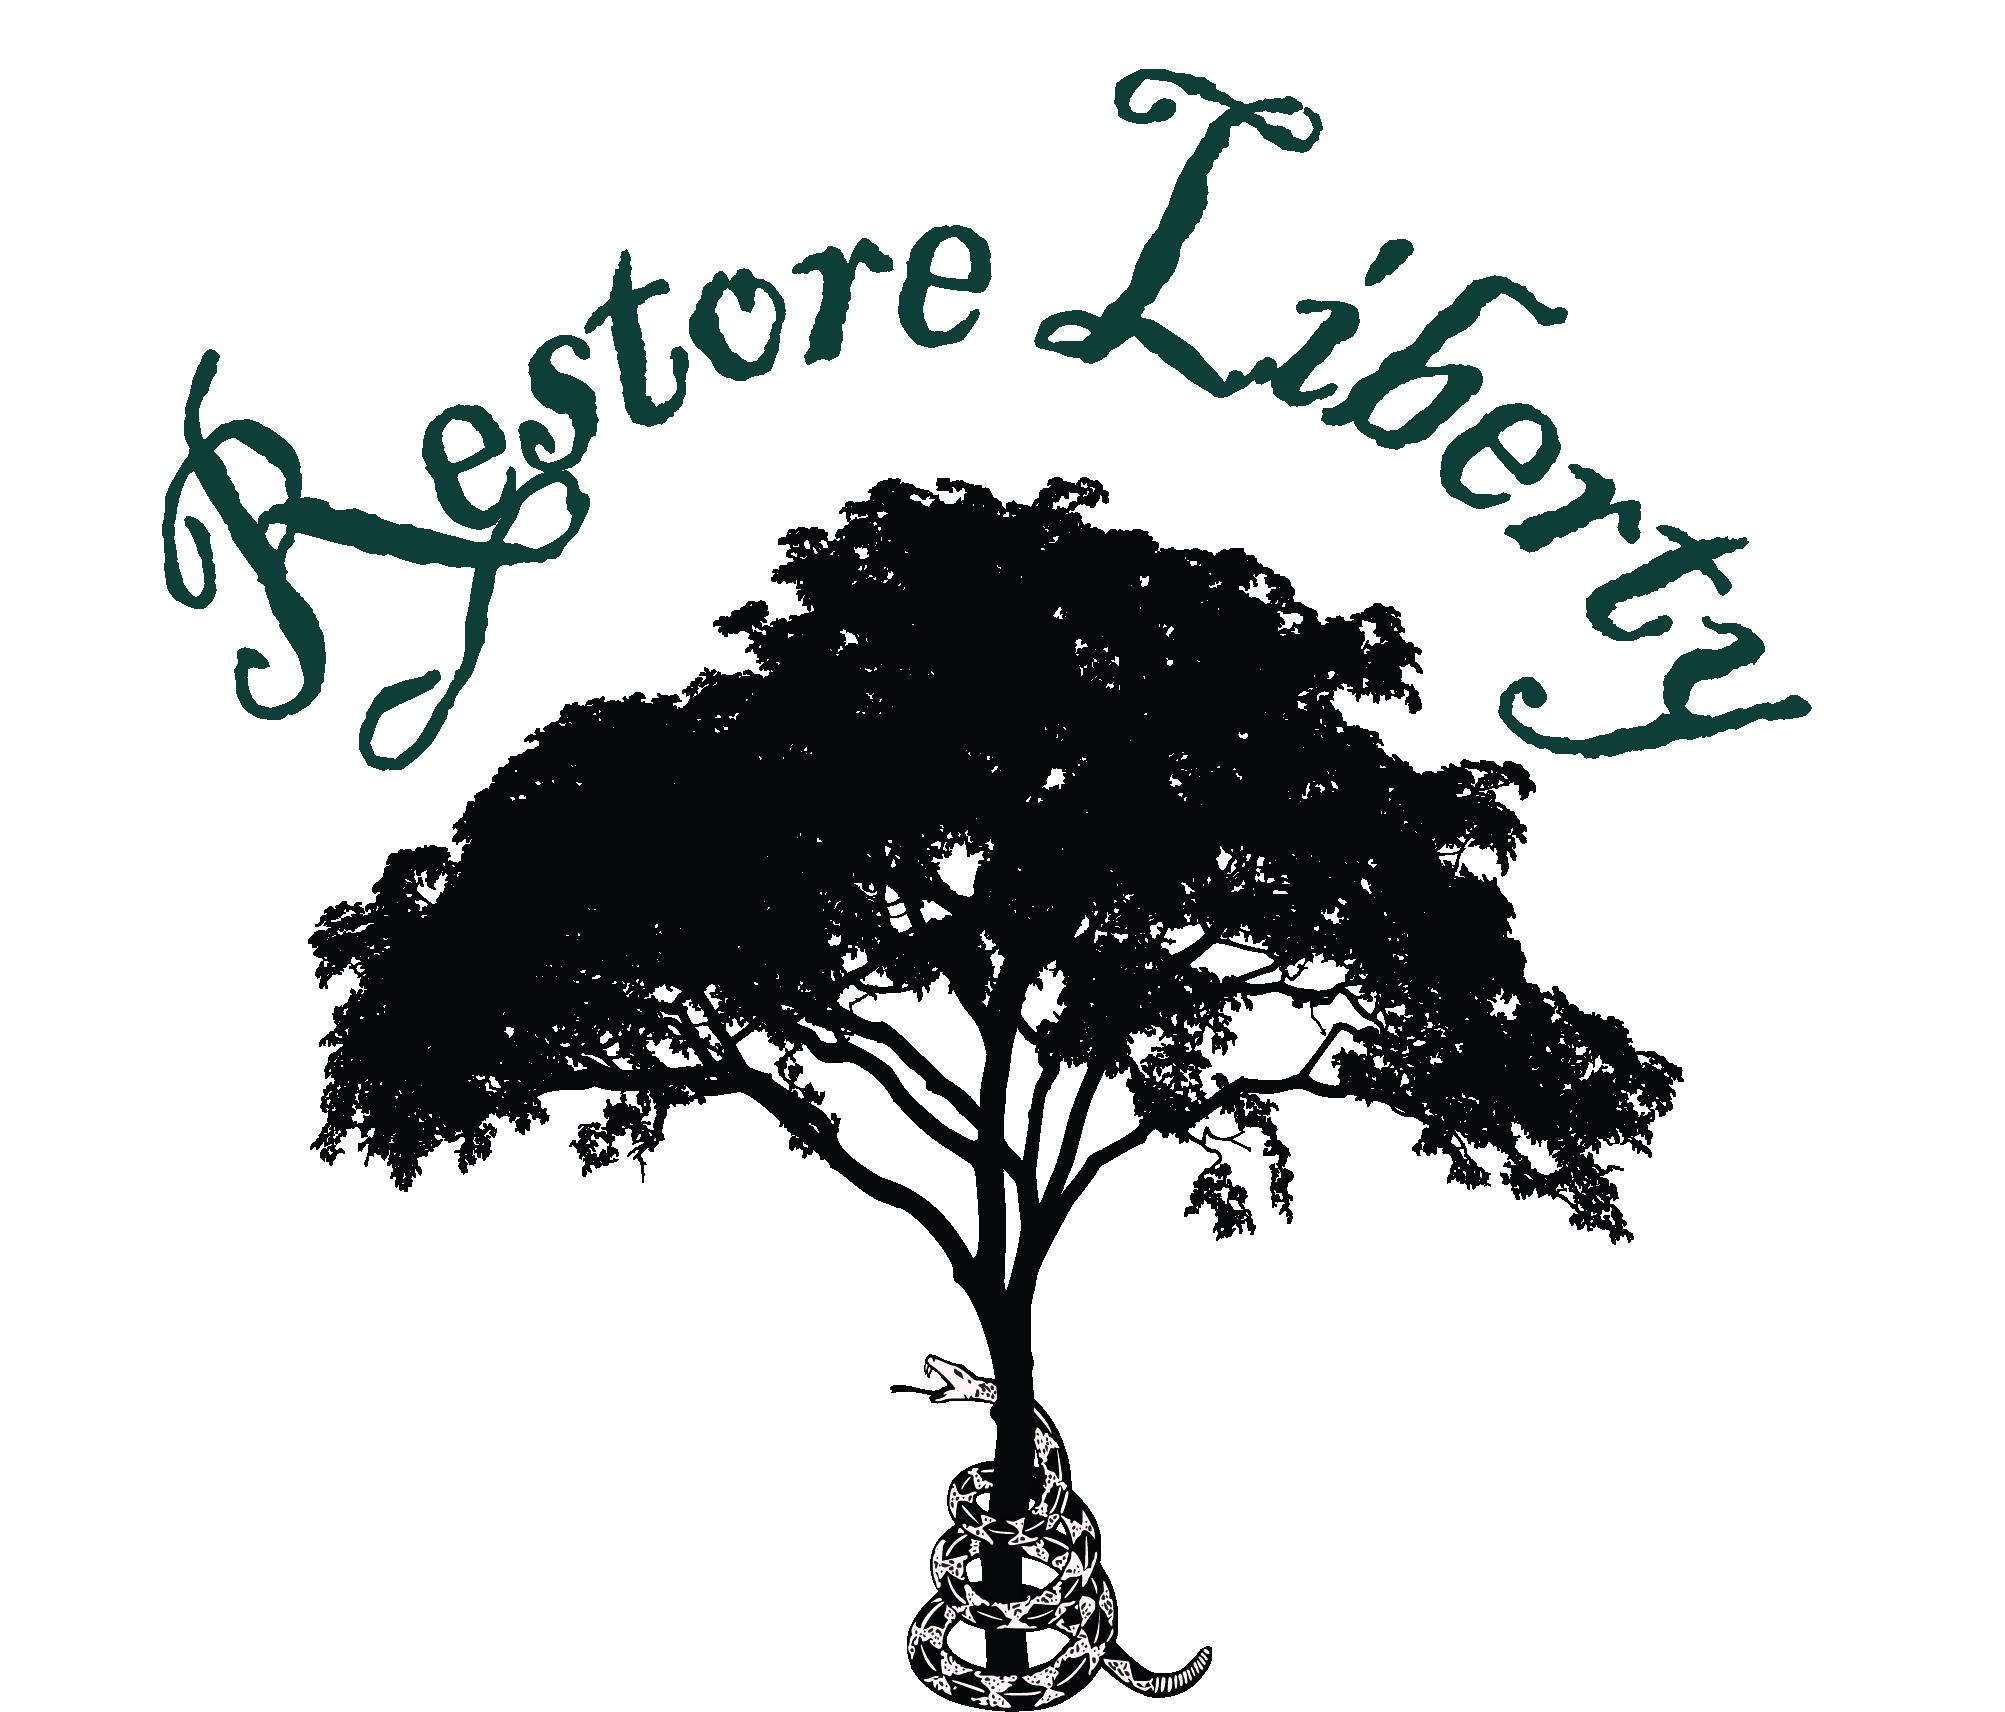 Restore Liberty Logo